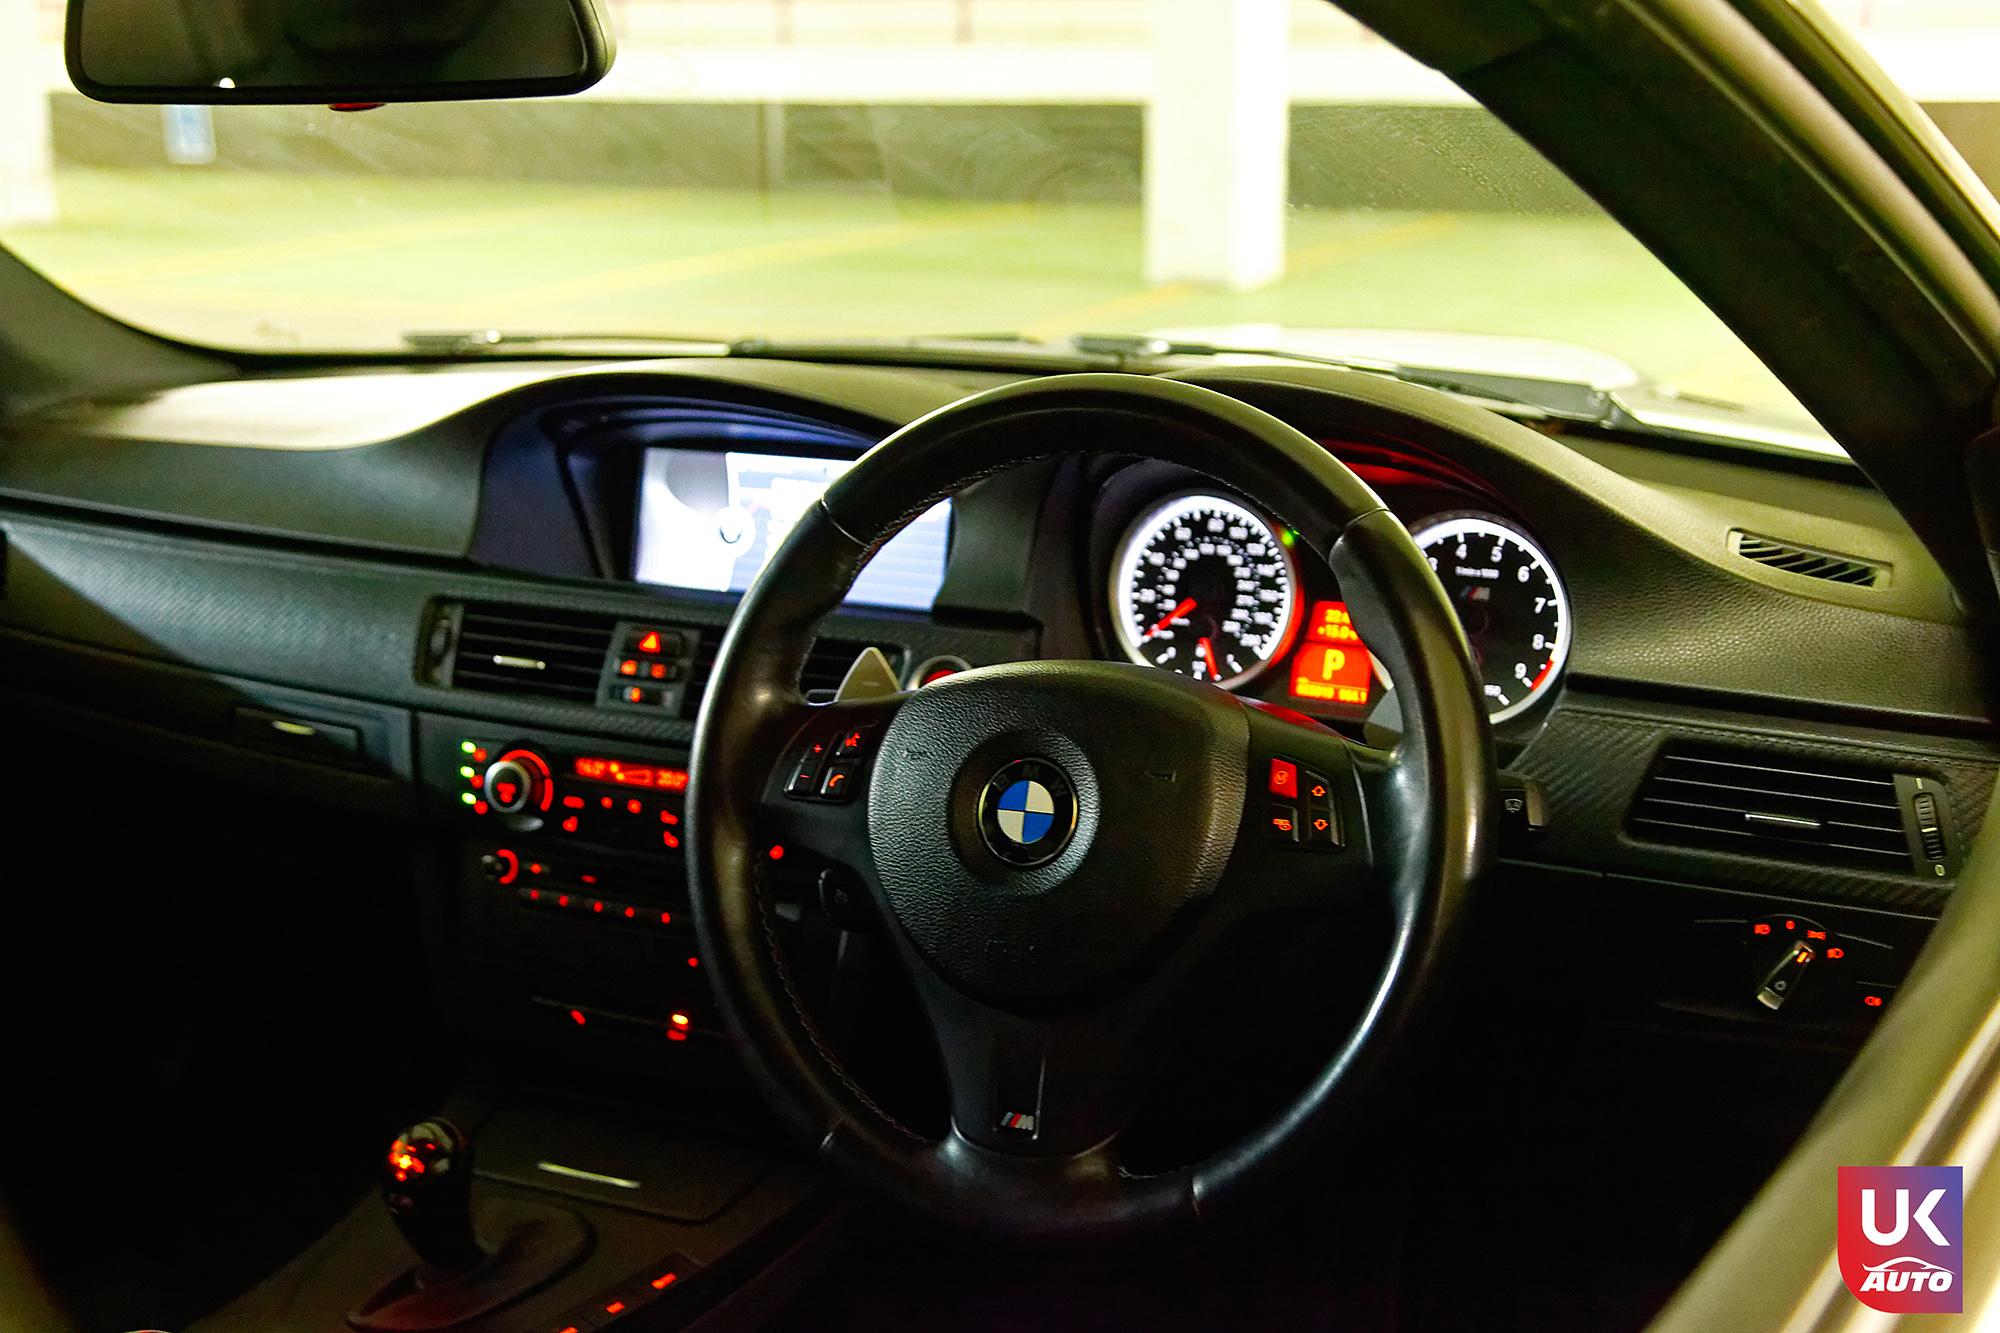 BMW m3 E92 import auto mandataire angleterre uk londres bmw leboncoin achat angleterre bmw voiture anglaise auto rhd e92 uk auto6 - Felecitation a Clement pour cette BMW M3 E92 COUPE RHD PACK CARBON BMW ANGLETERRE VOITURE UK